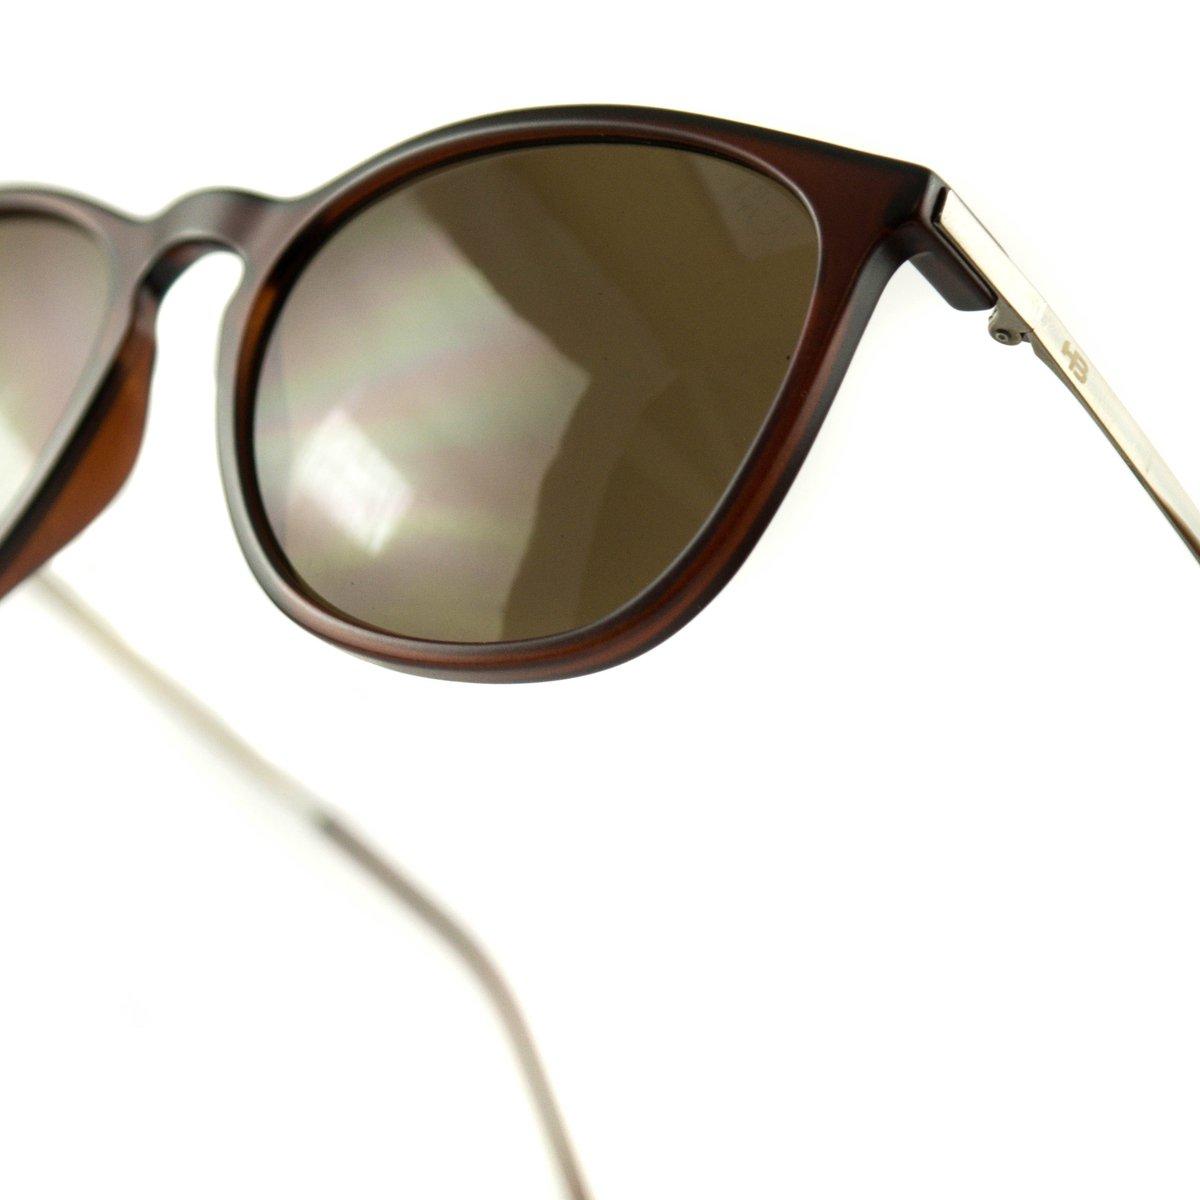 Óculos HB Tanami - Marrom - Compre Agora   Netshoes c6299ab829